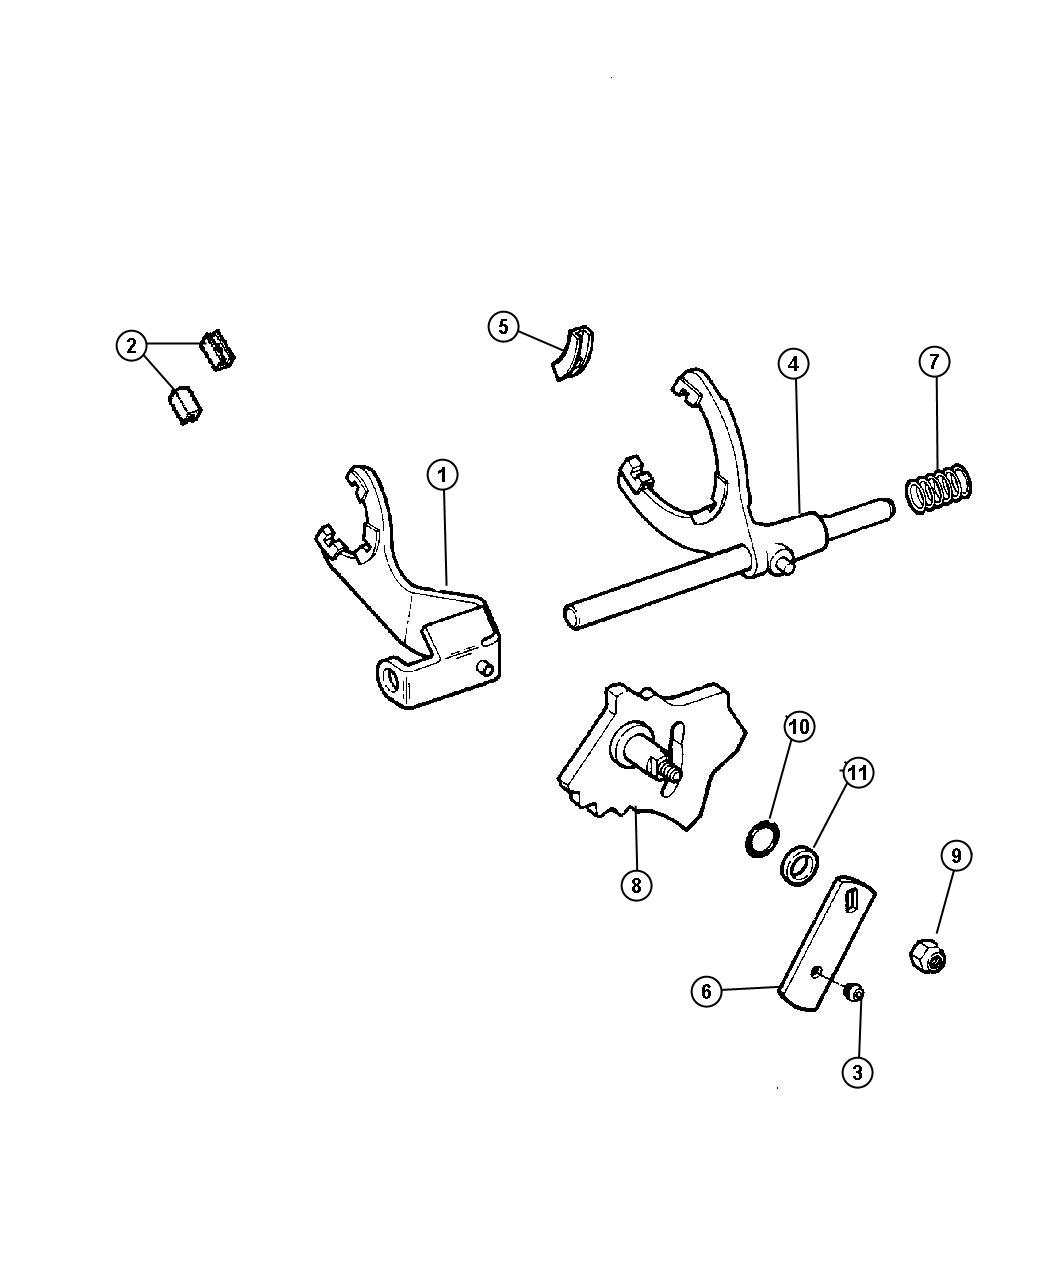 Jeep Wrangler Bushing Shift Lever Applicationpolice